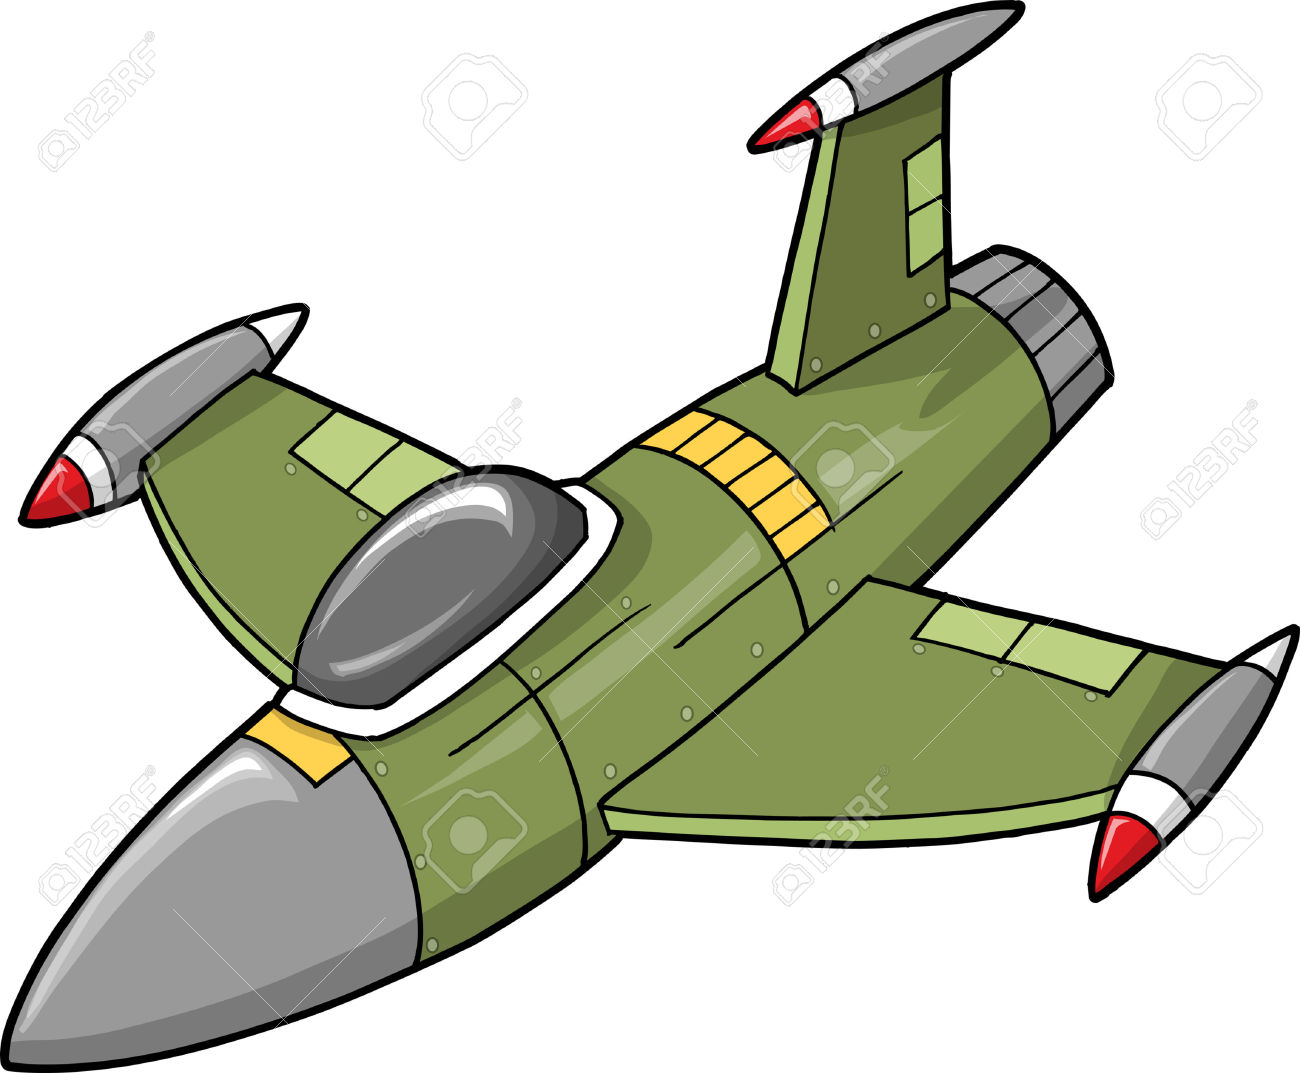 Cartoon Fighter Jet Clipart.